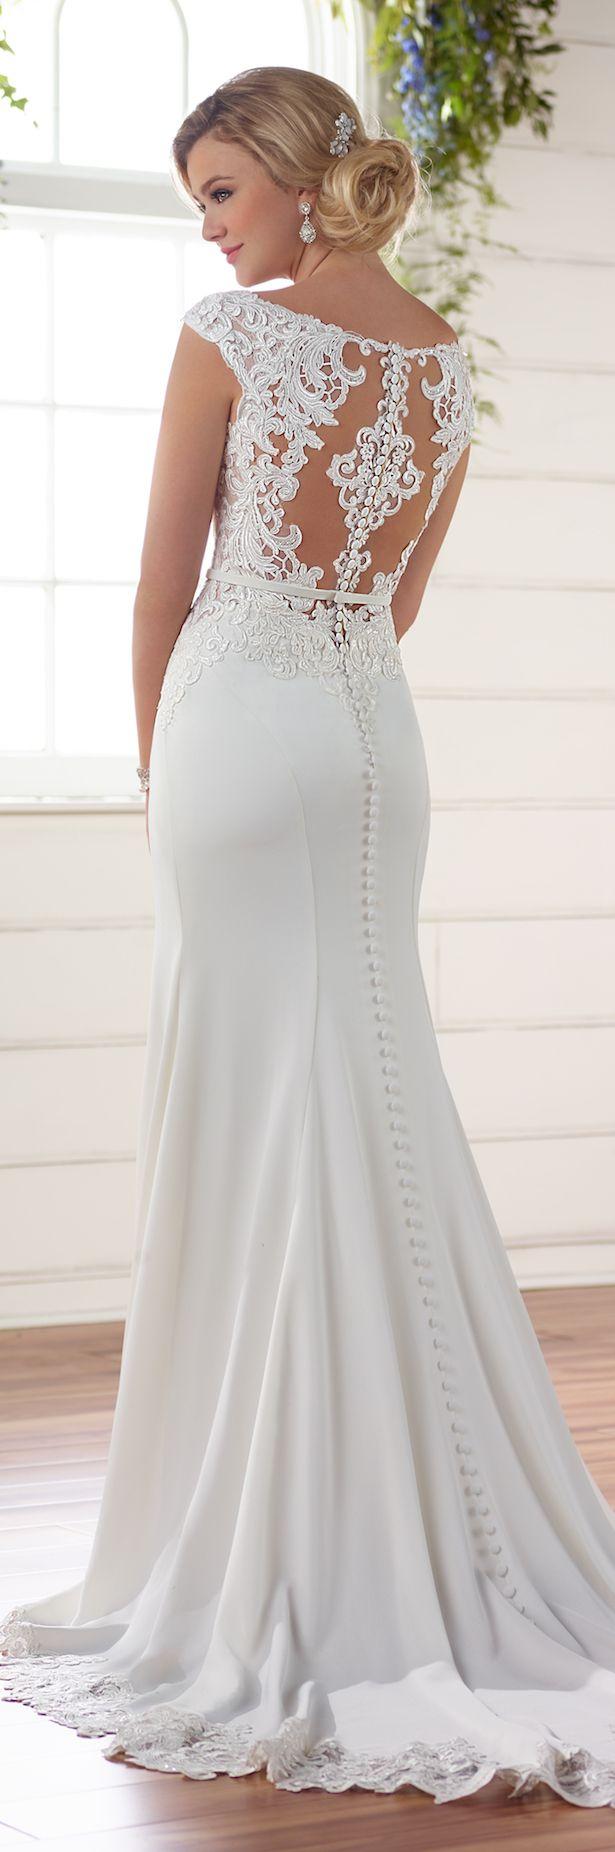 Essense of Australia Spring 2017 Bridal Collection ...